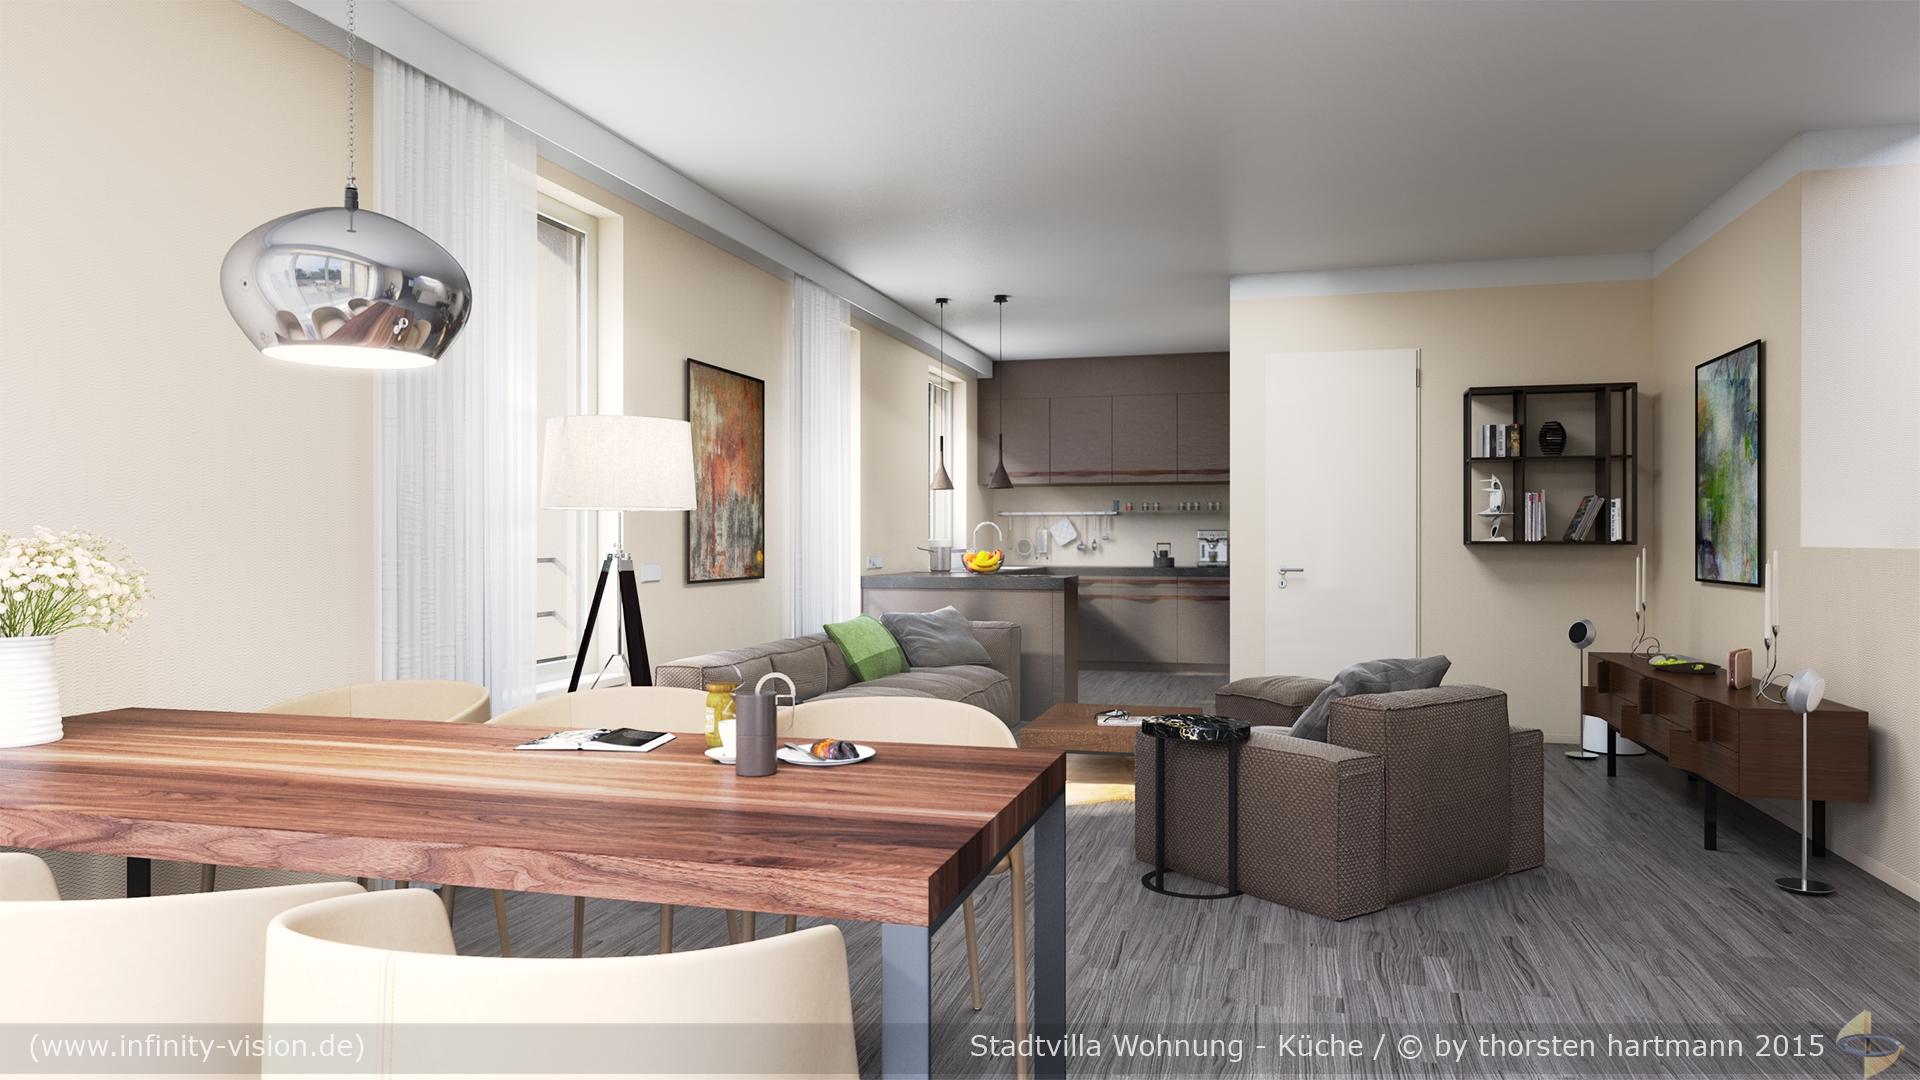 Interiors Final Update: 3D Artist & Interior Designer +49 (0) 30